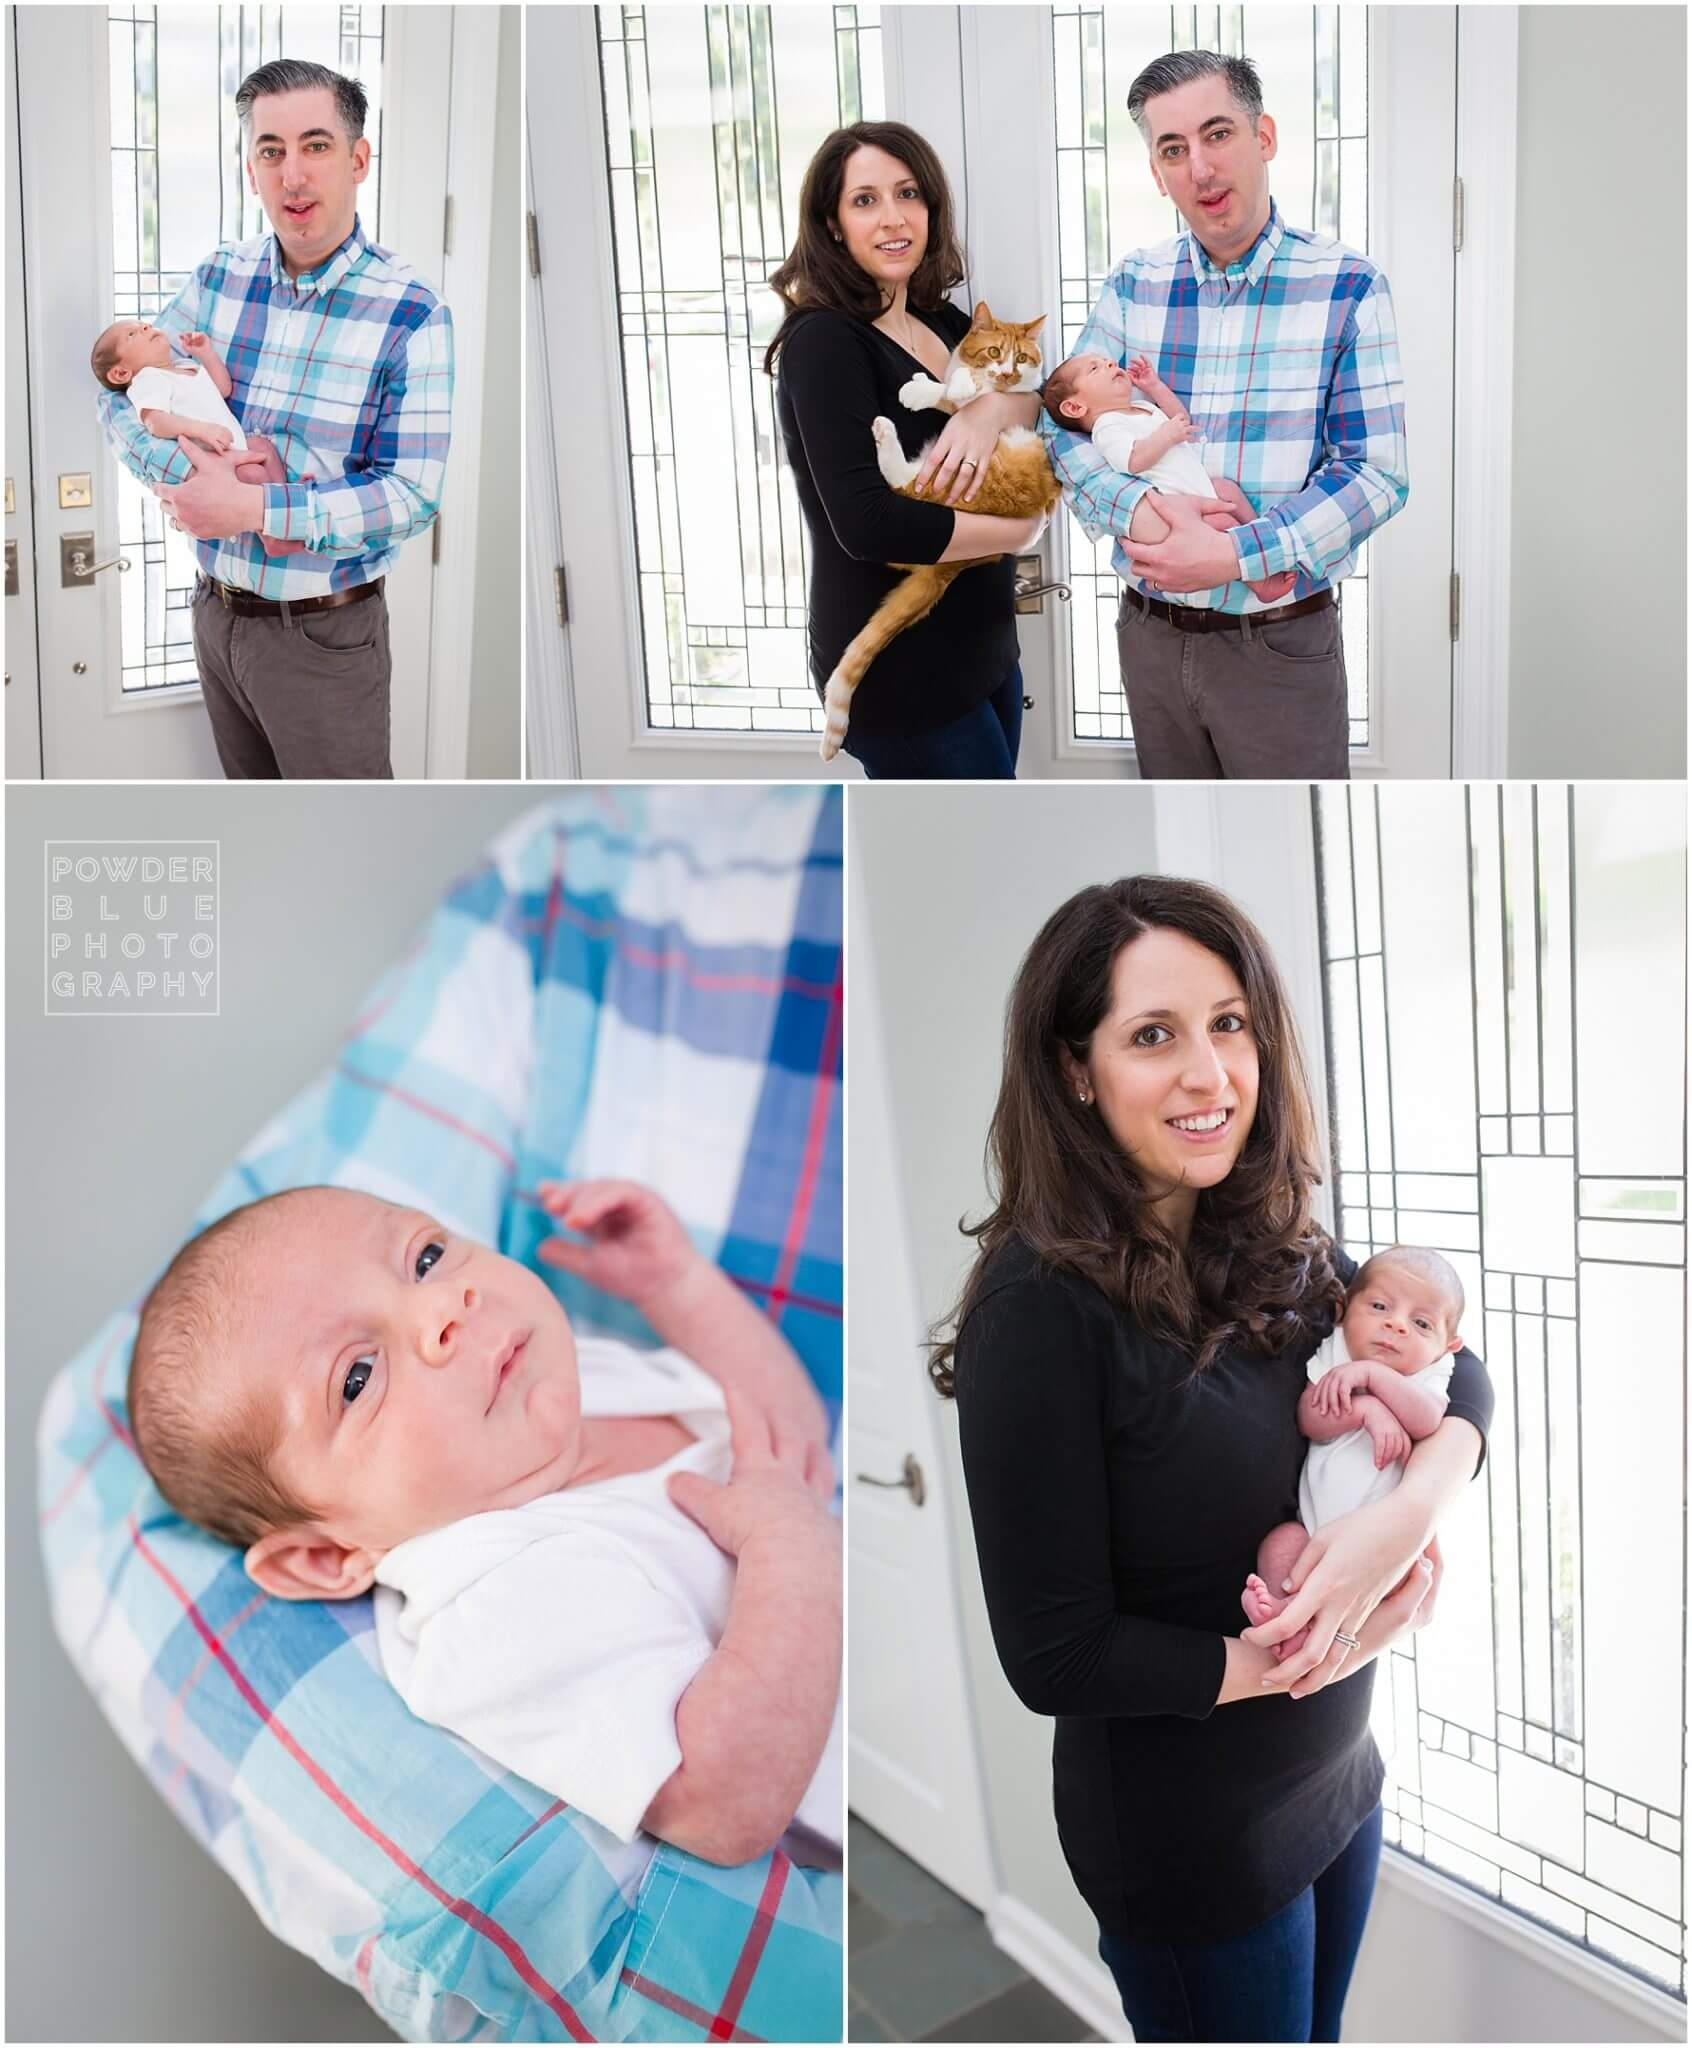 pittsburgh newborn photographer, in home lifestyle newborn session mt lebanon pittsburgh pa